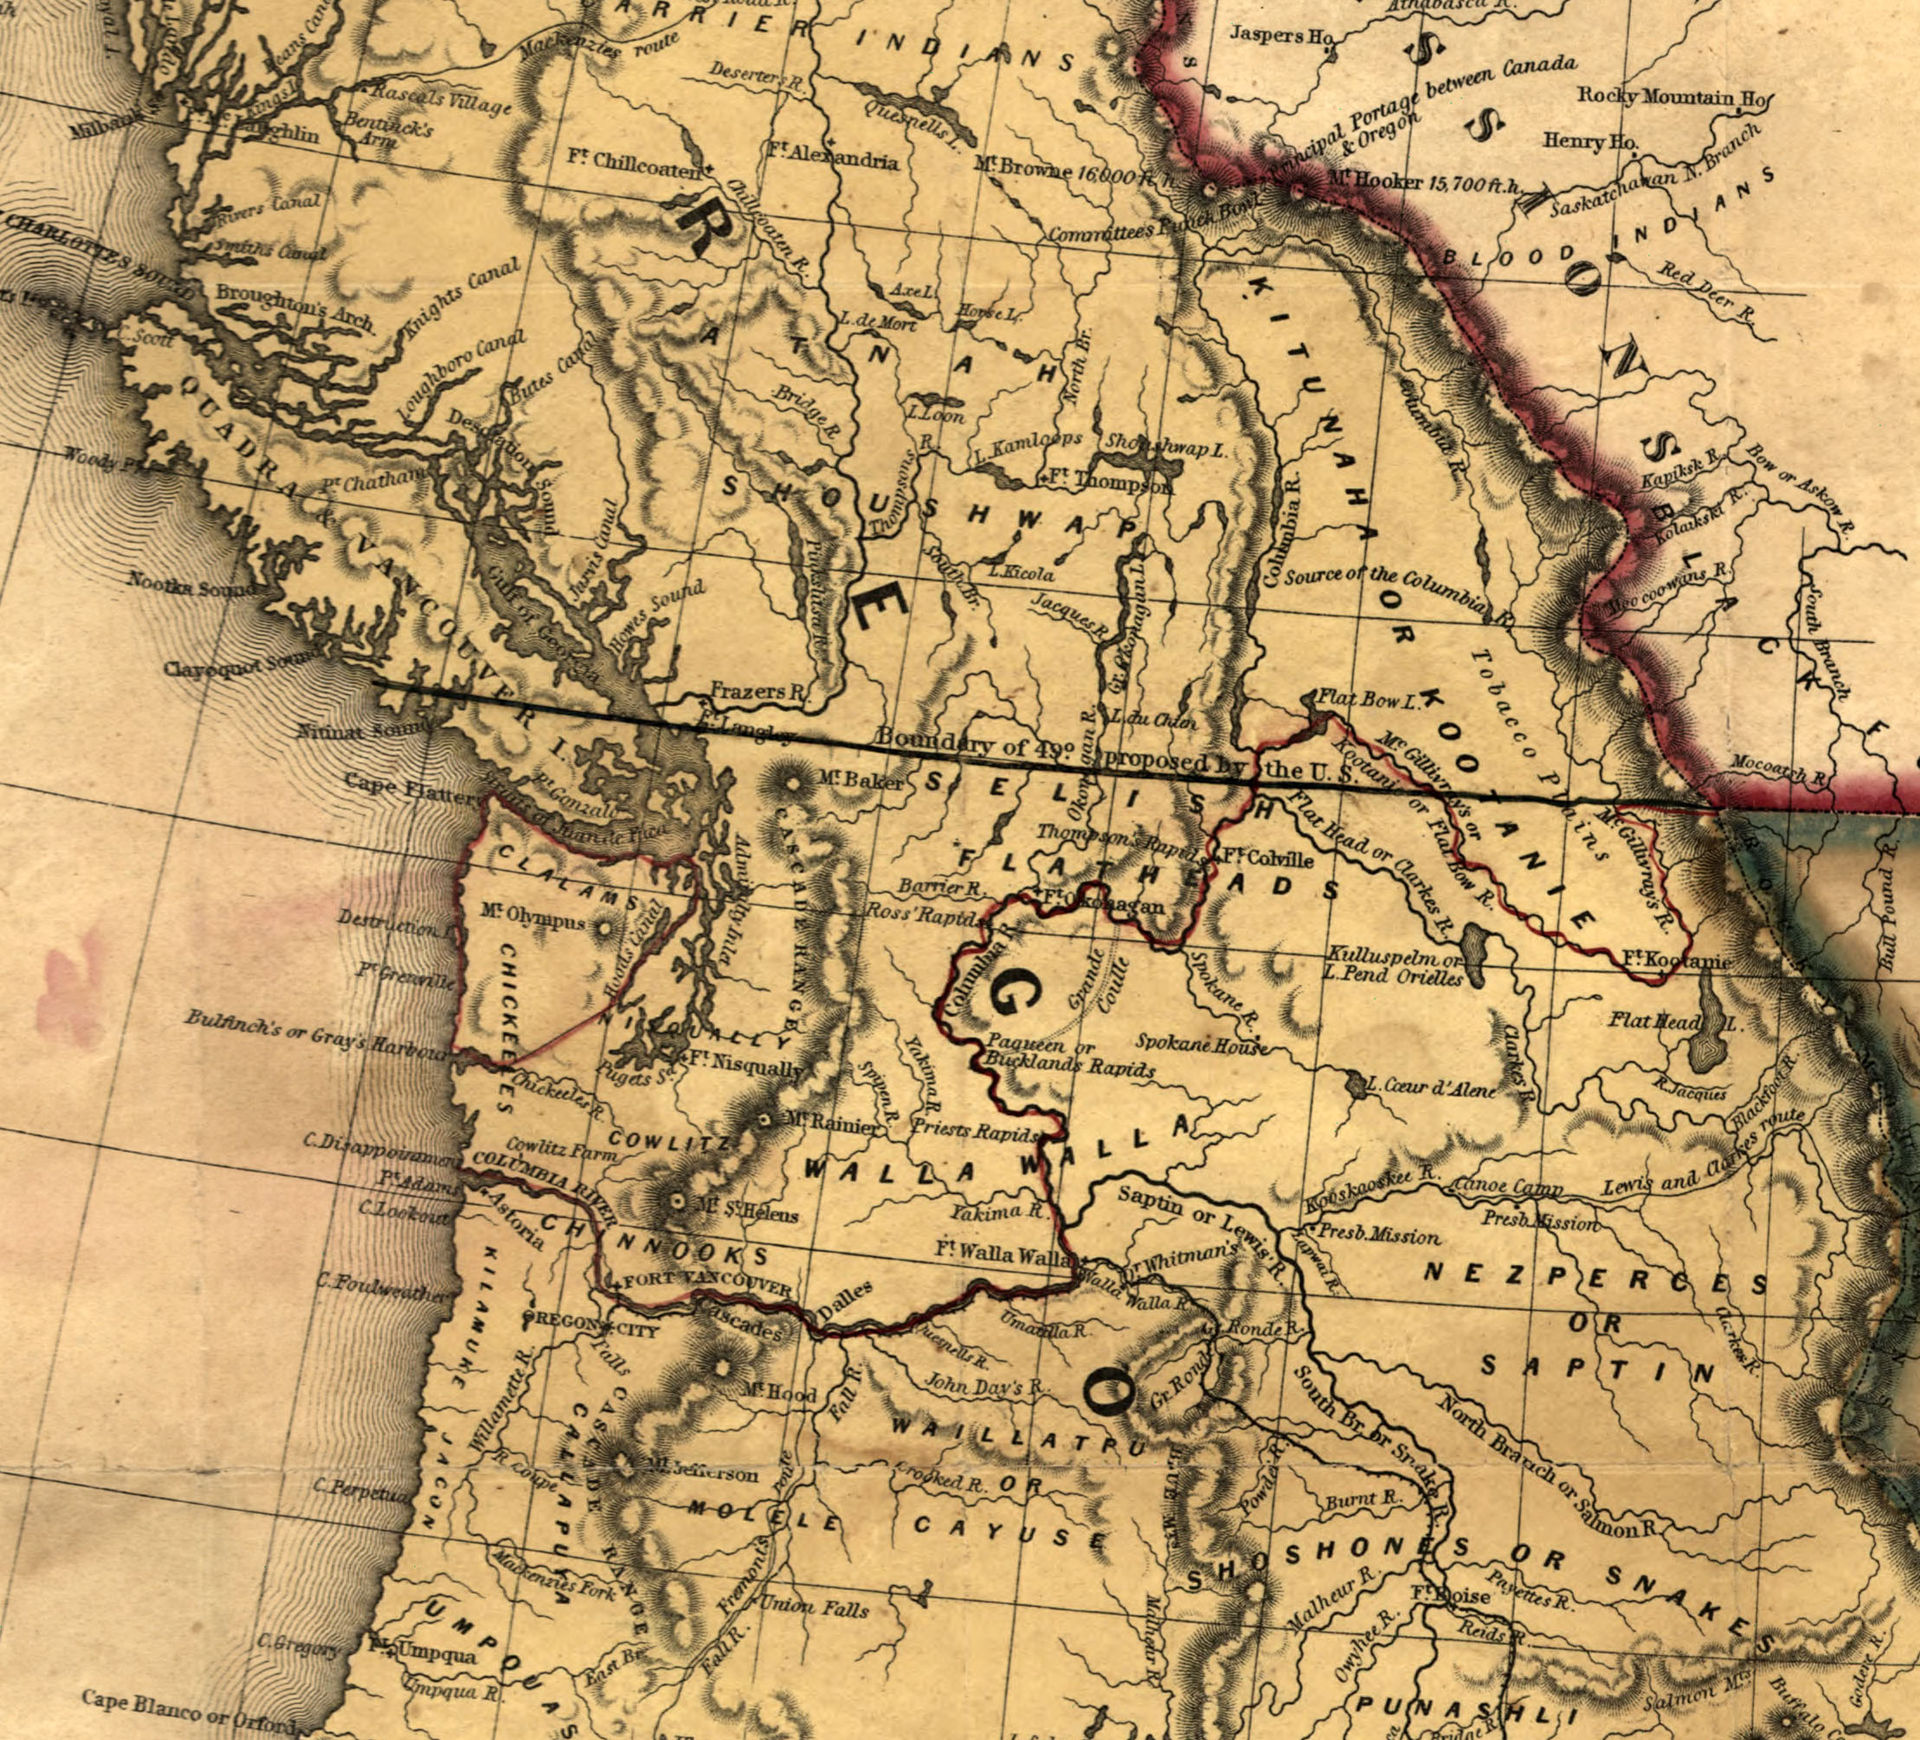 1846_Oregon_territory.jpg